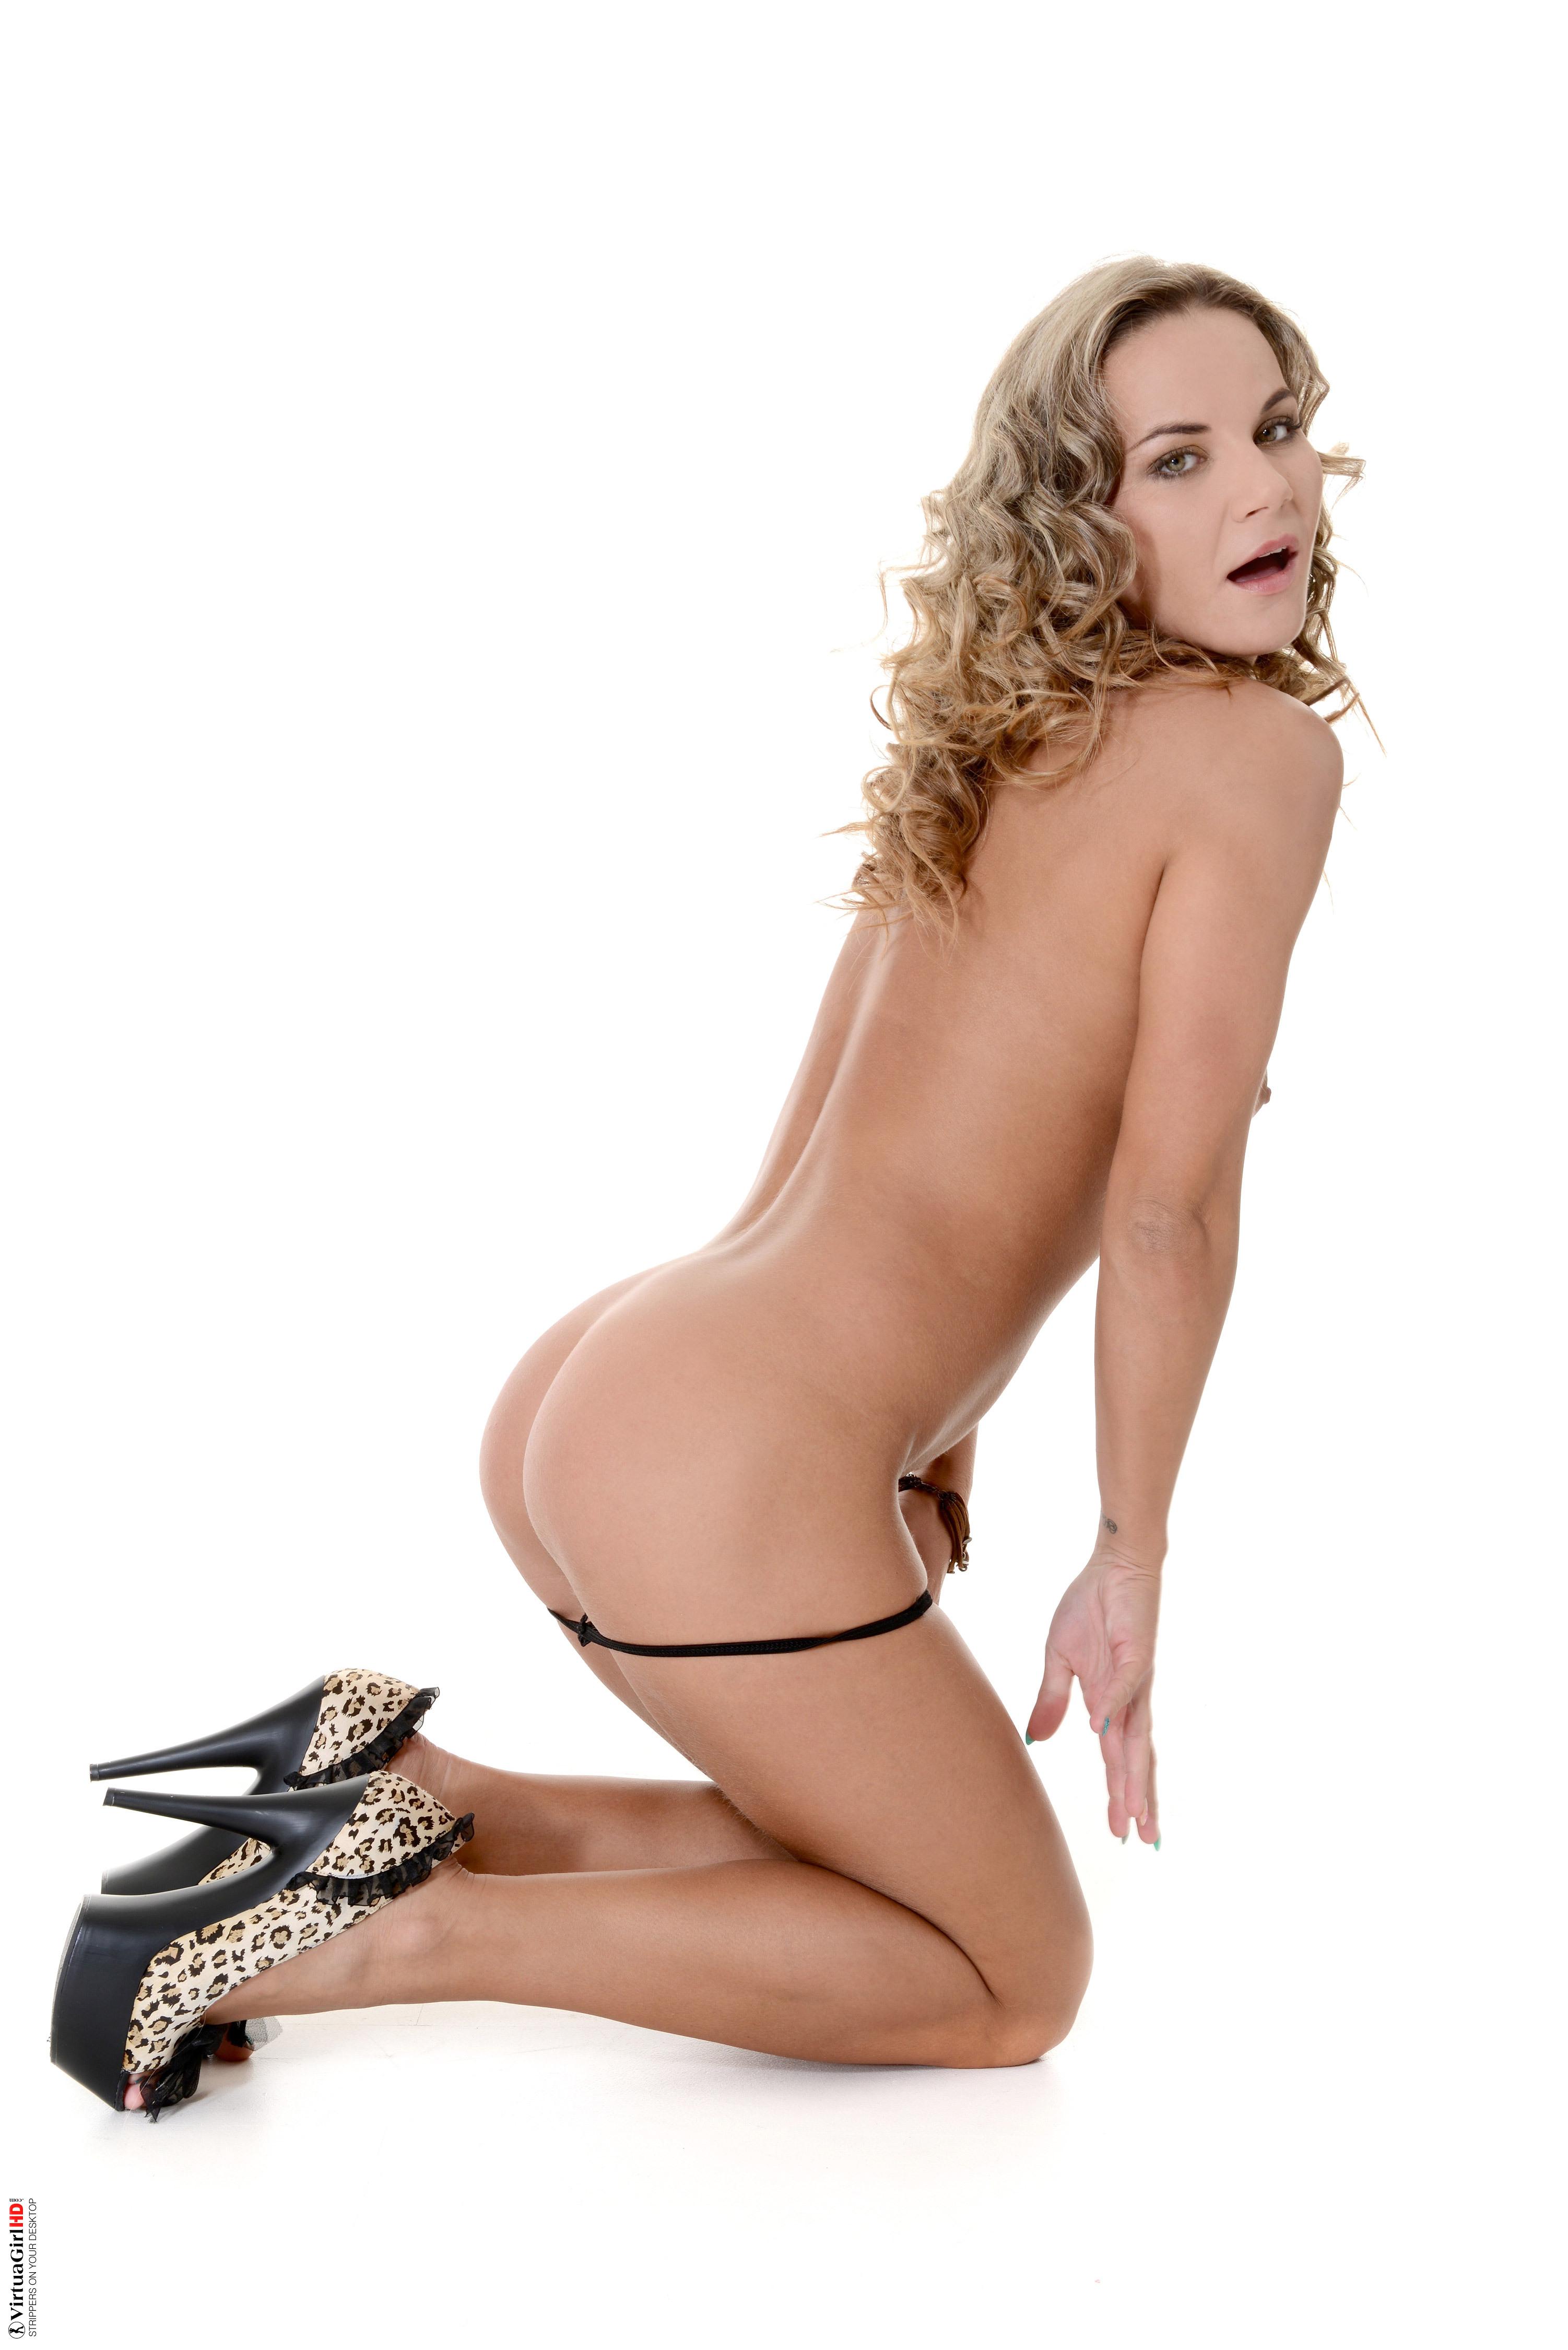 erotic nude asian lesbian wallpaper